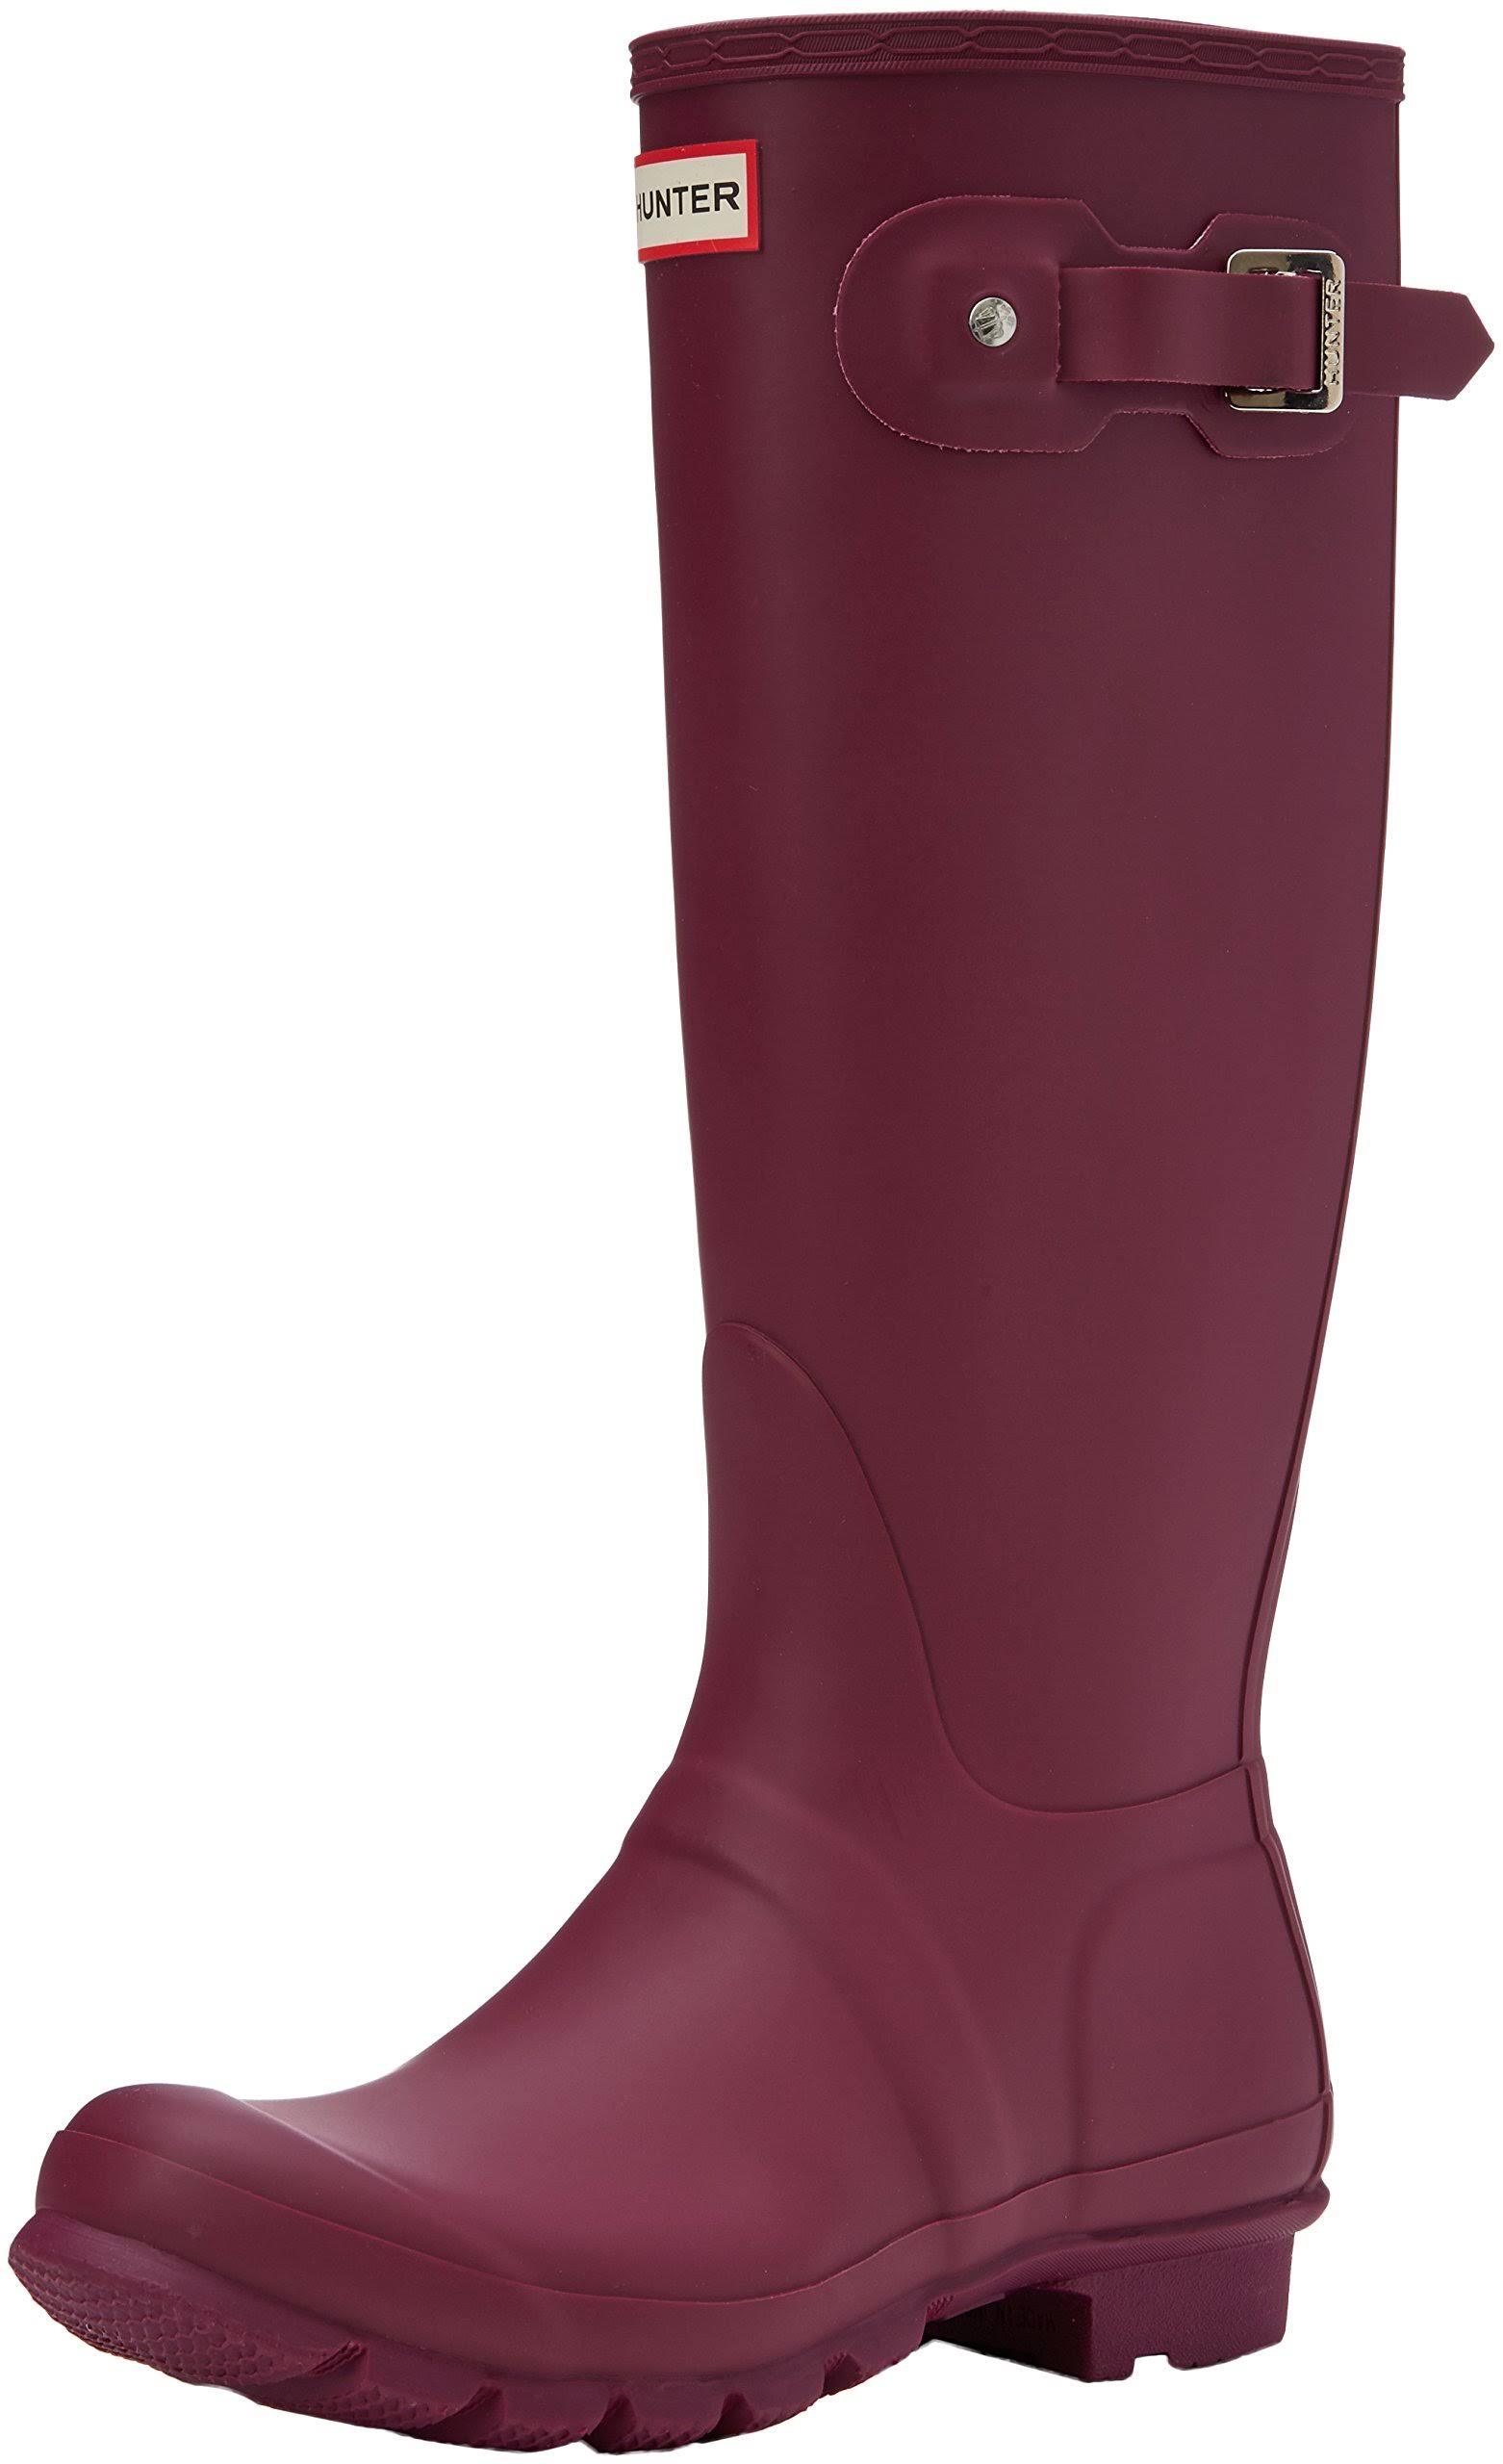 Rain Hunter's Tall Original BootsViolet7 Violet SUMVpz